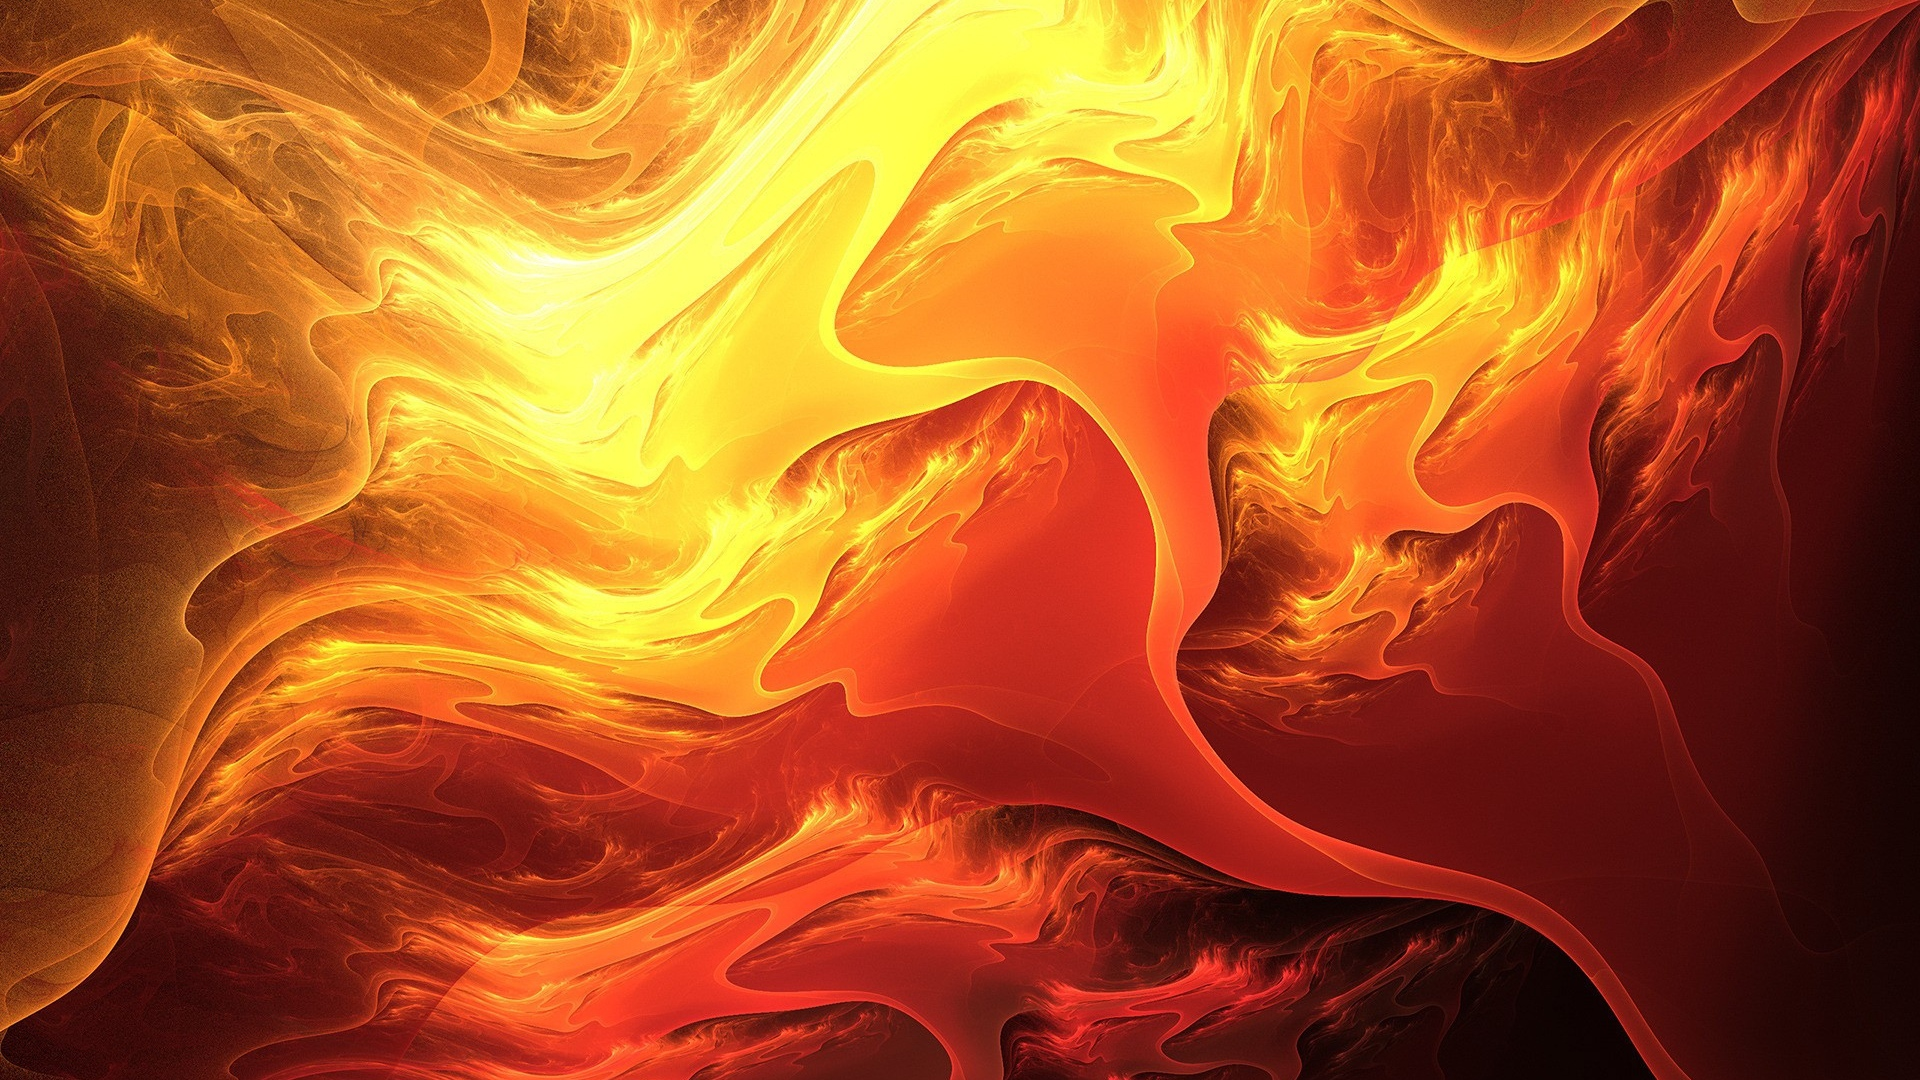 download wallpaper 1920x1080 fire, paint, orange, yellow full hd